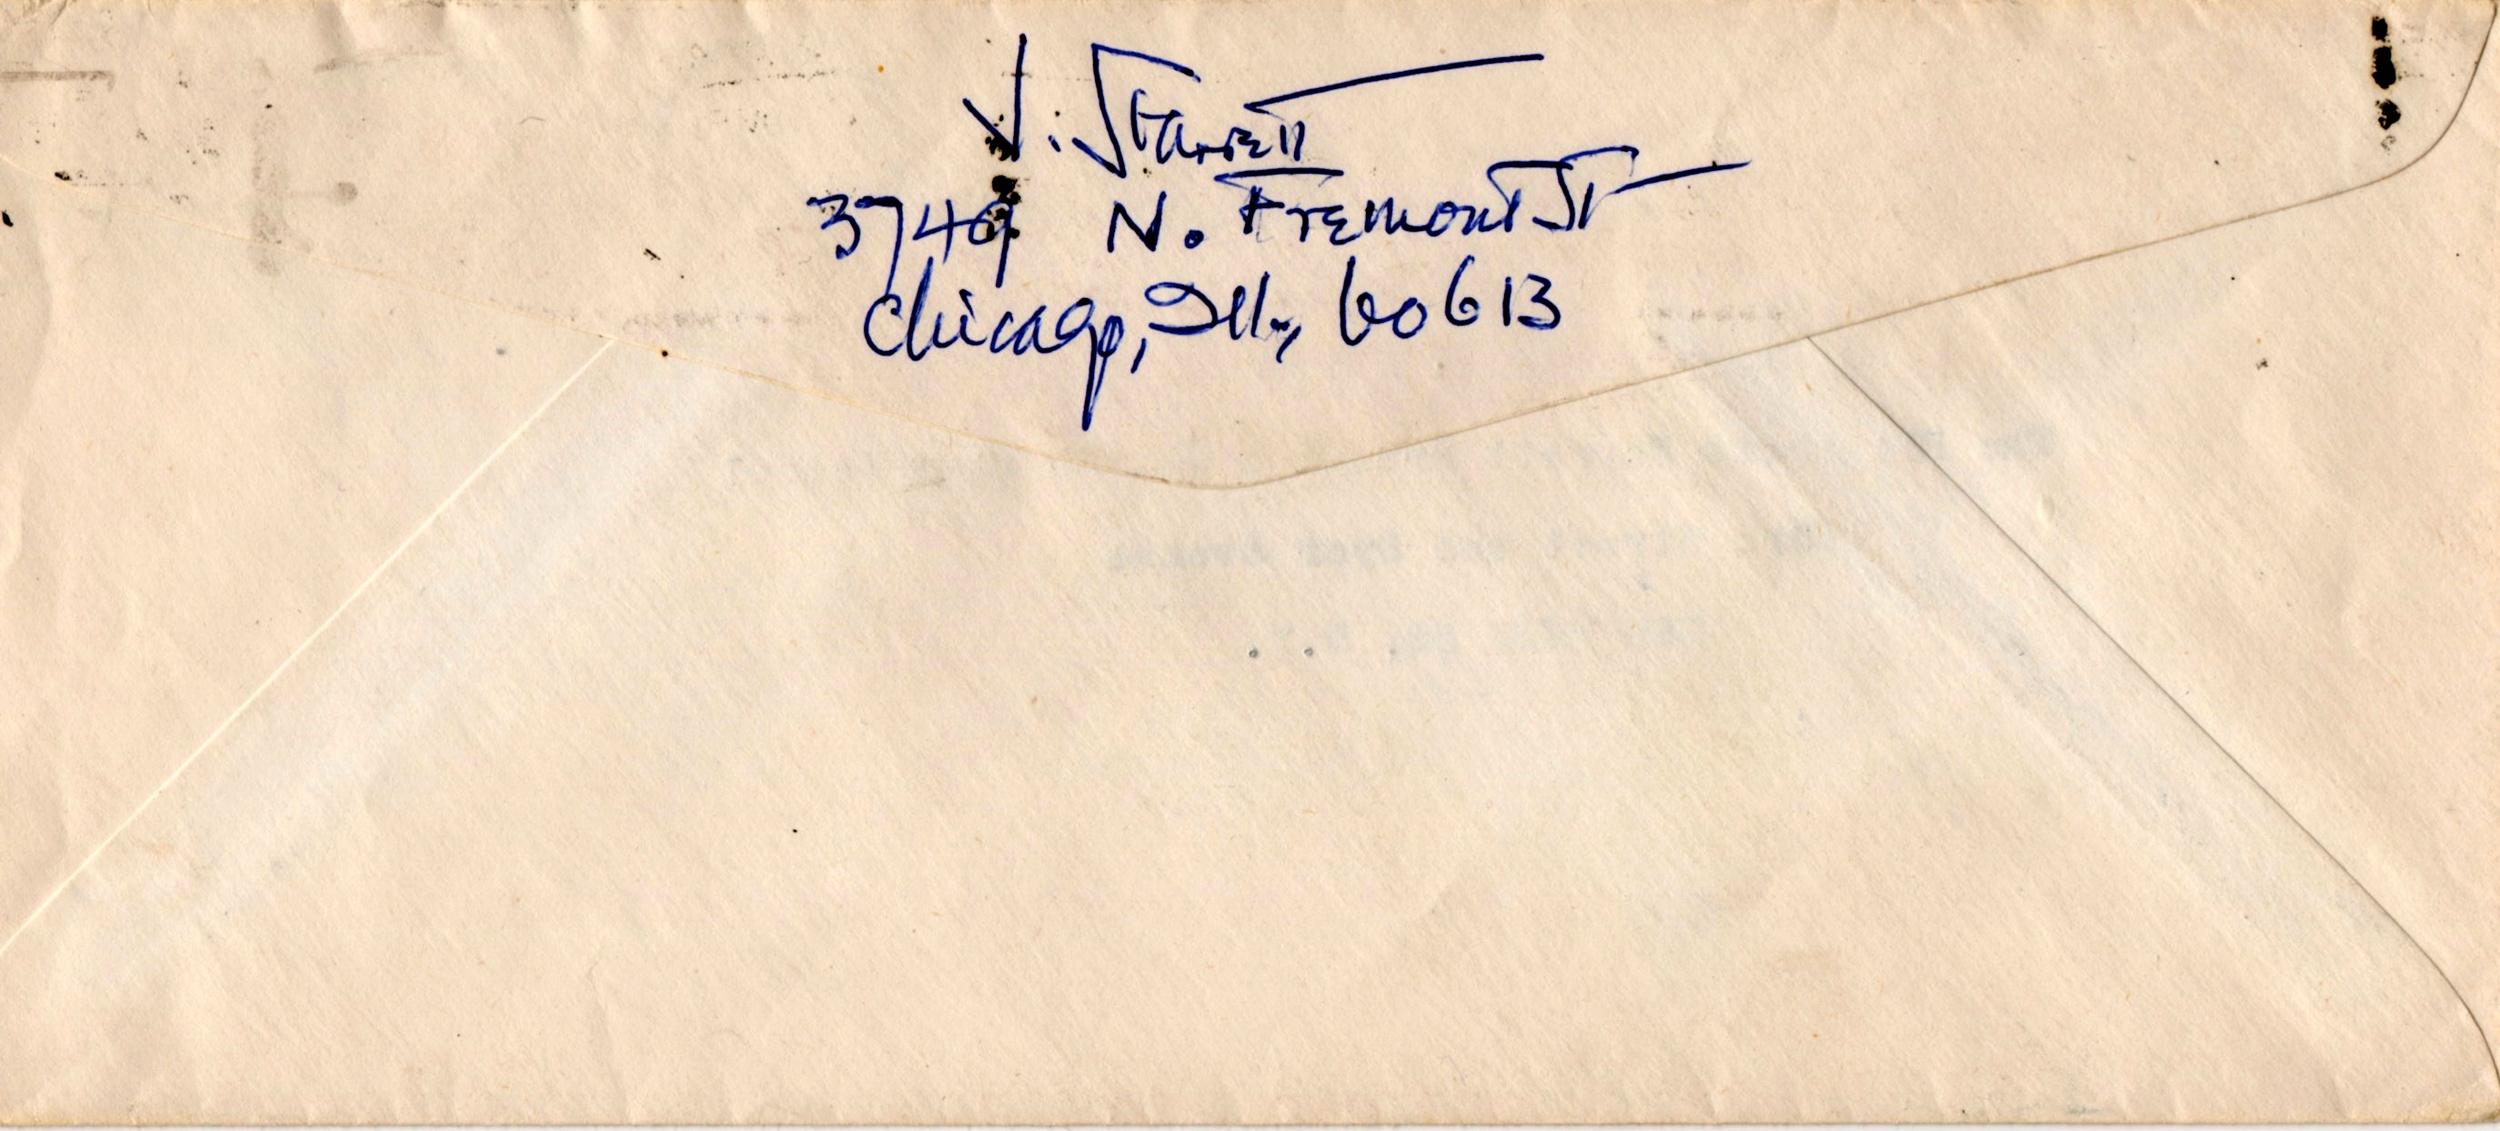 Envelopes2.jpeg